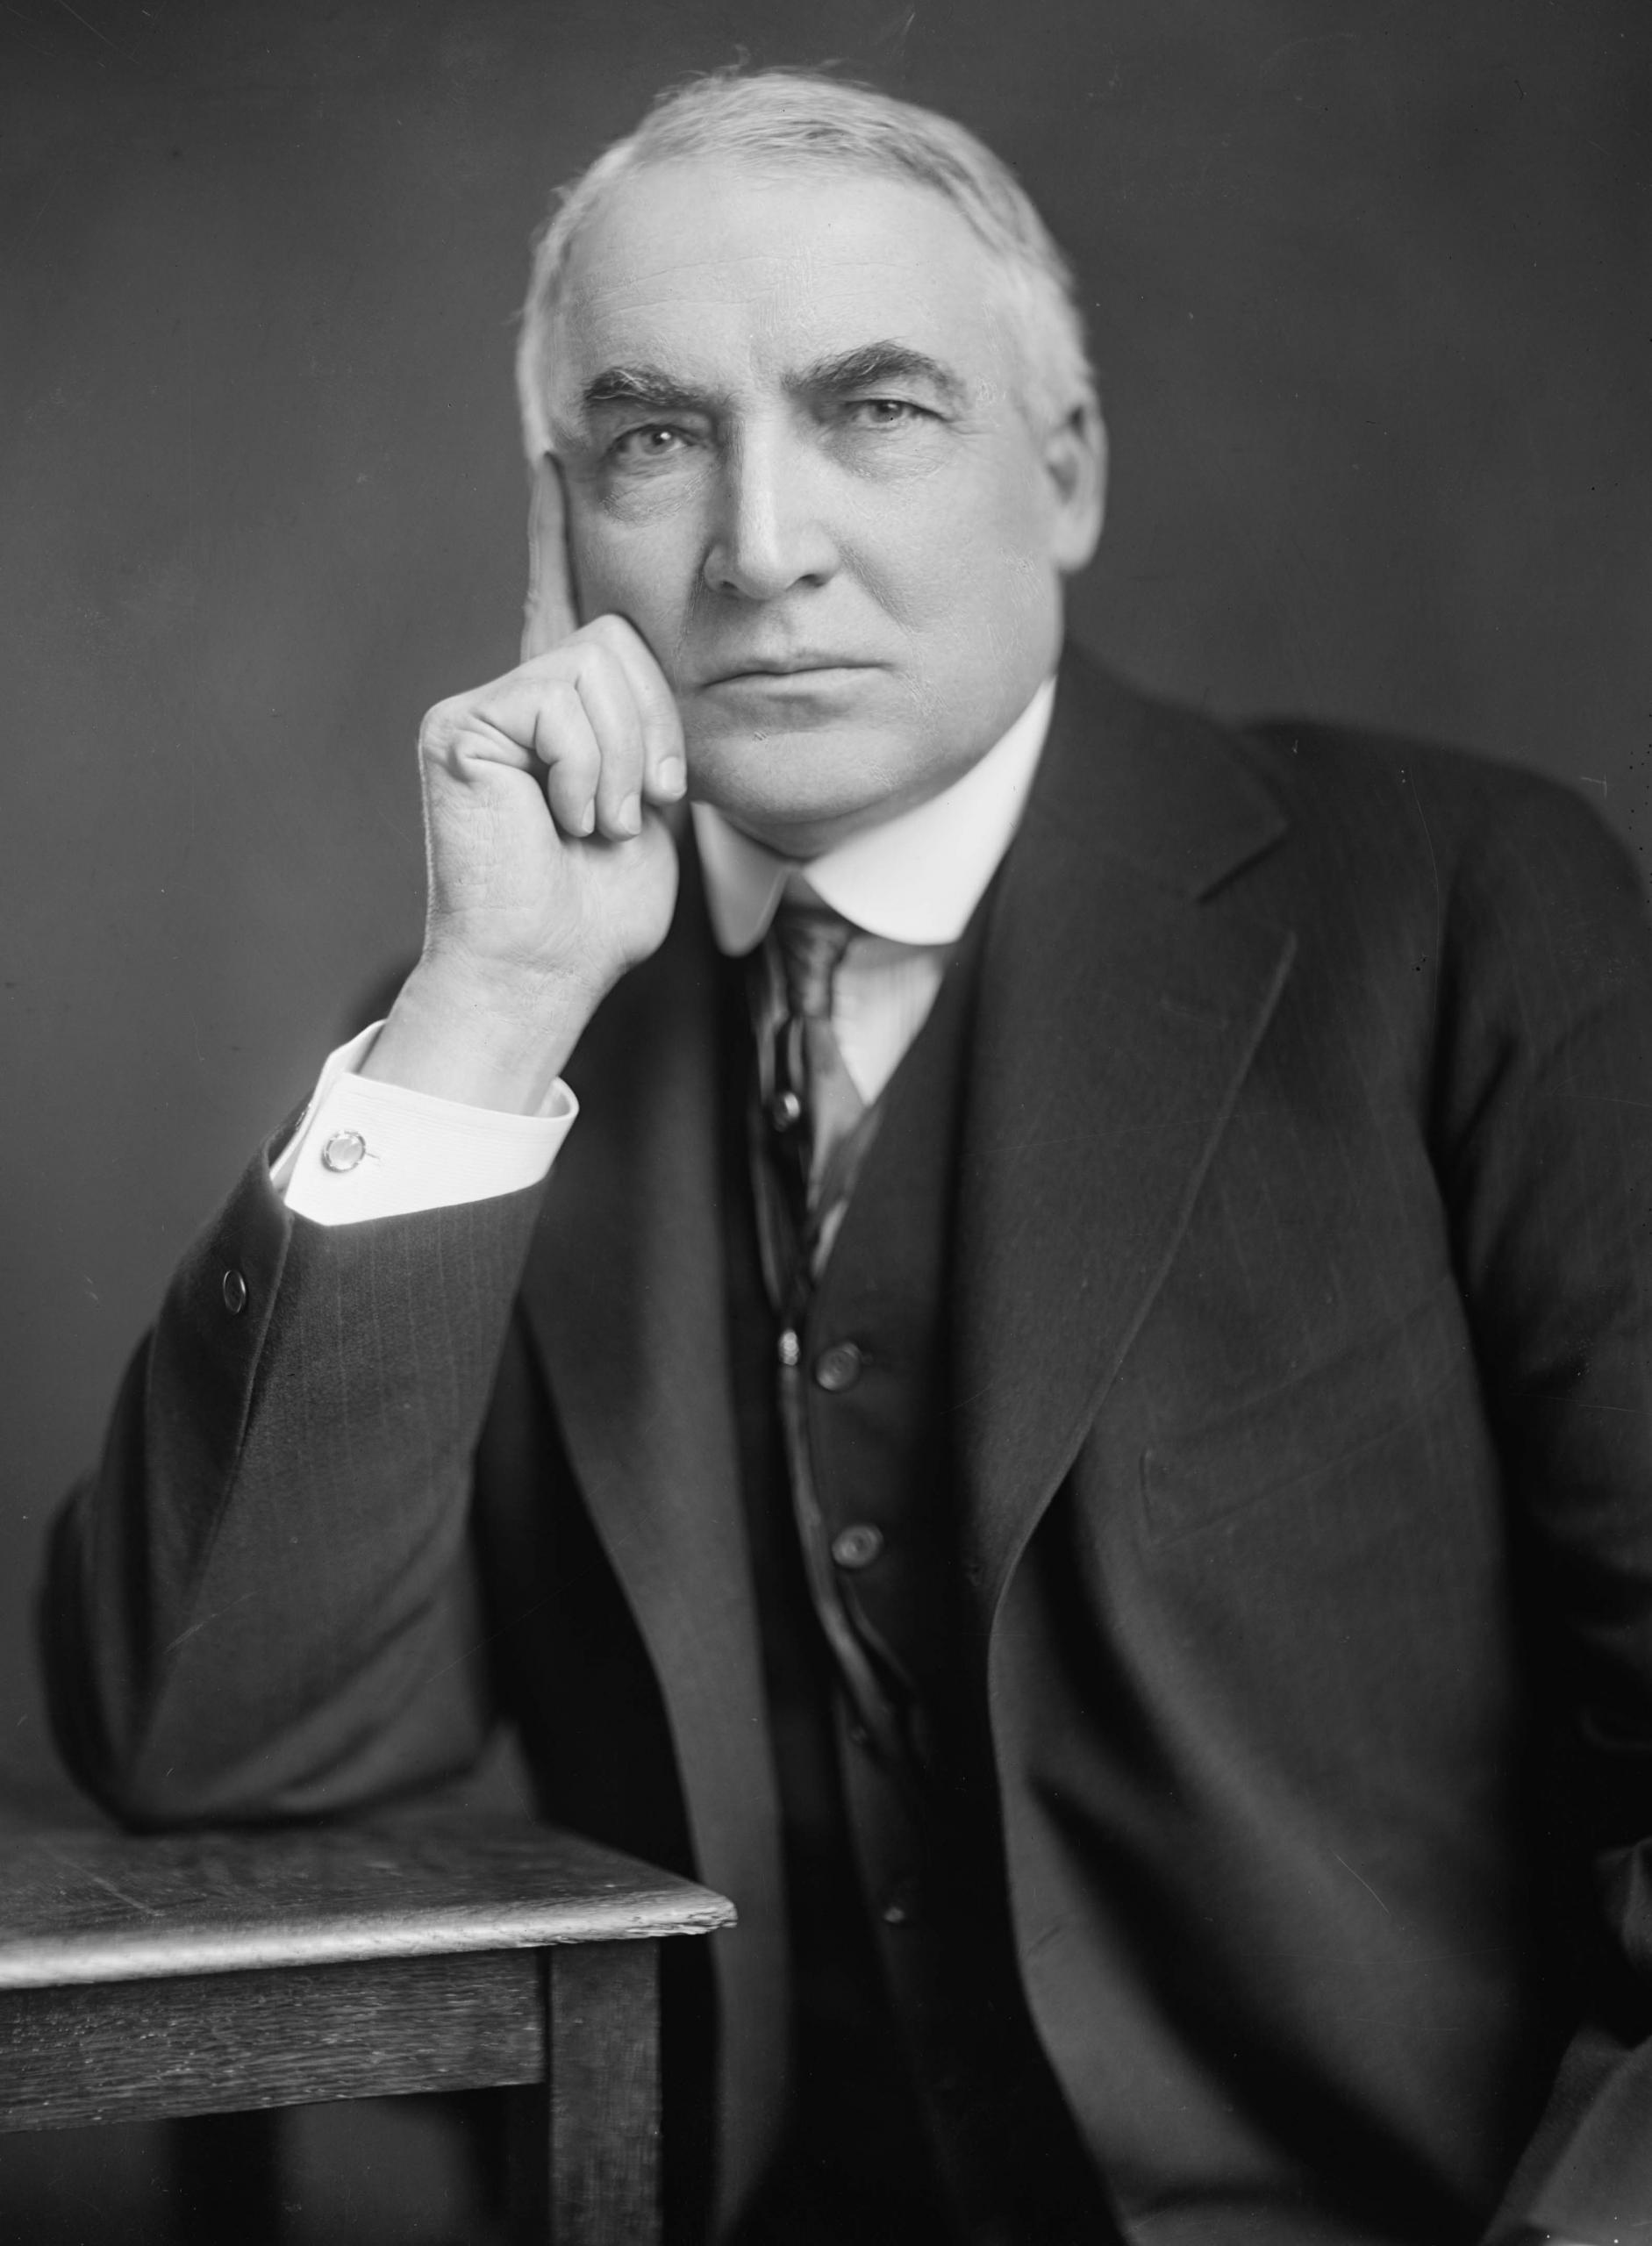 Warren G. Harding (COURTESY OF NARA)